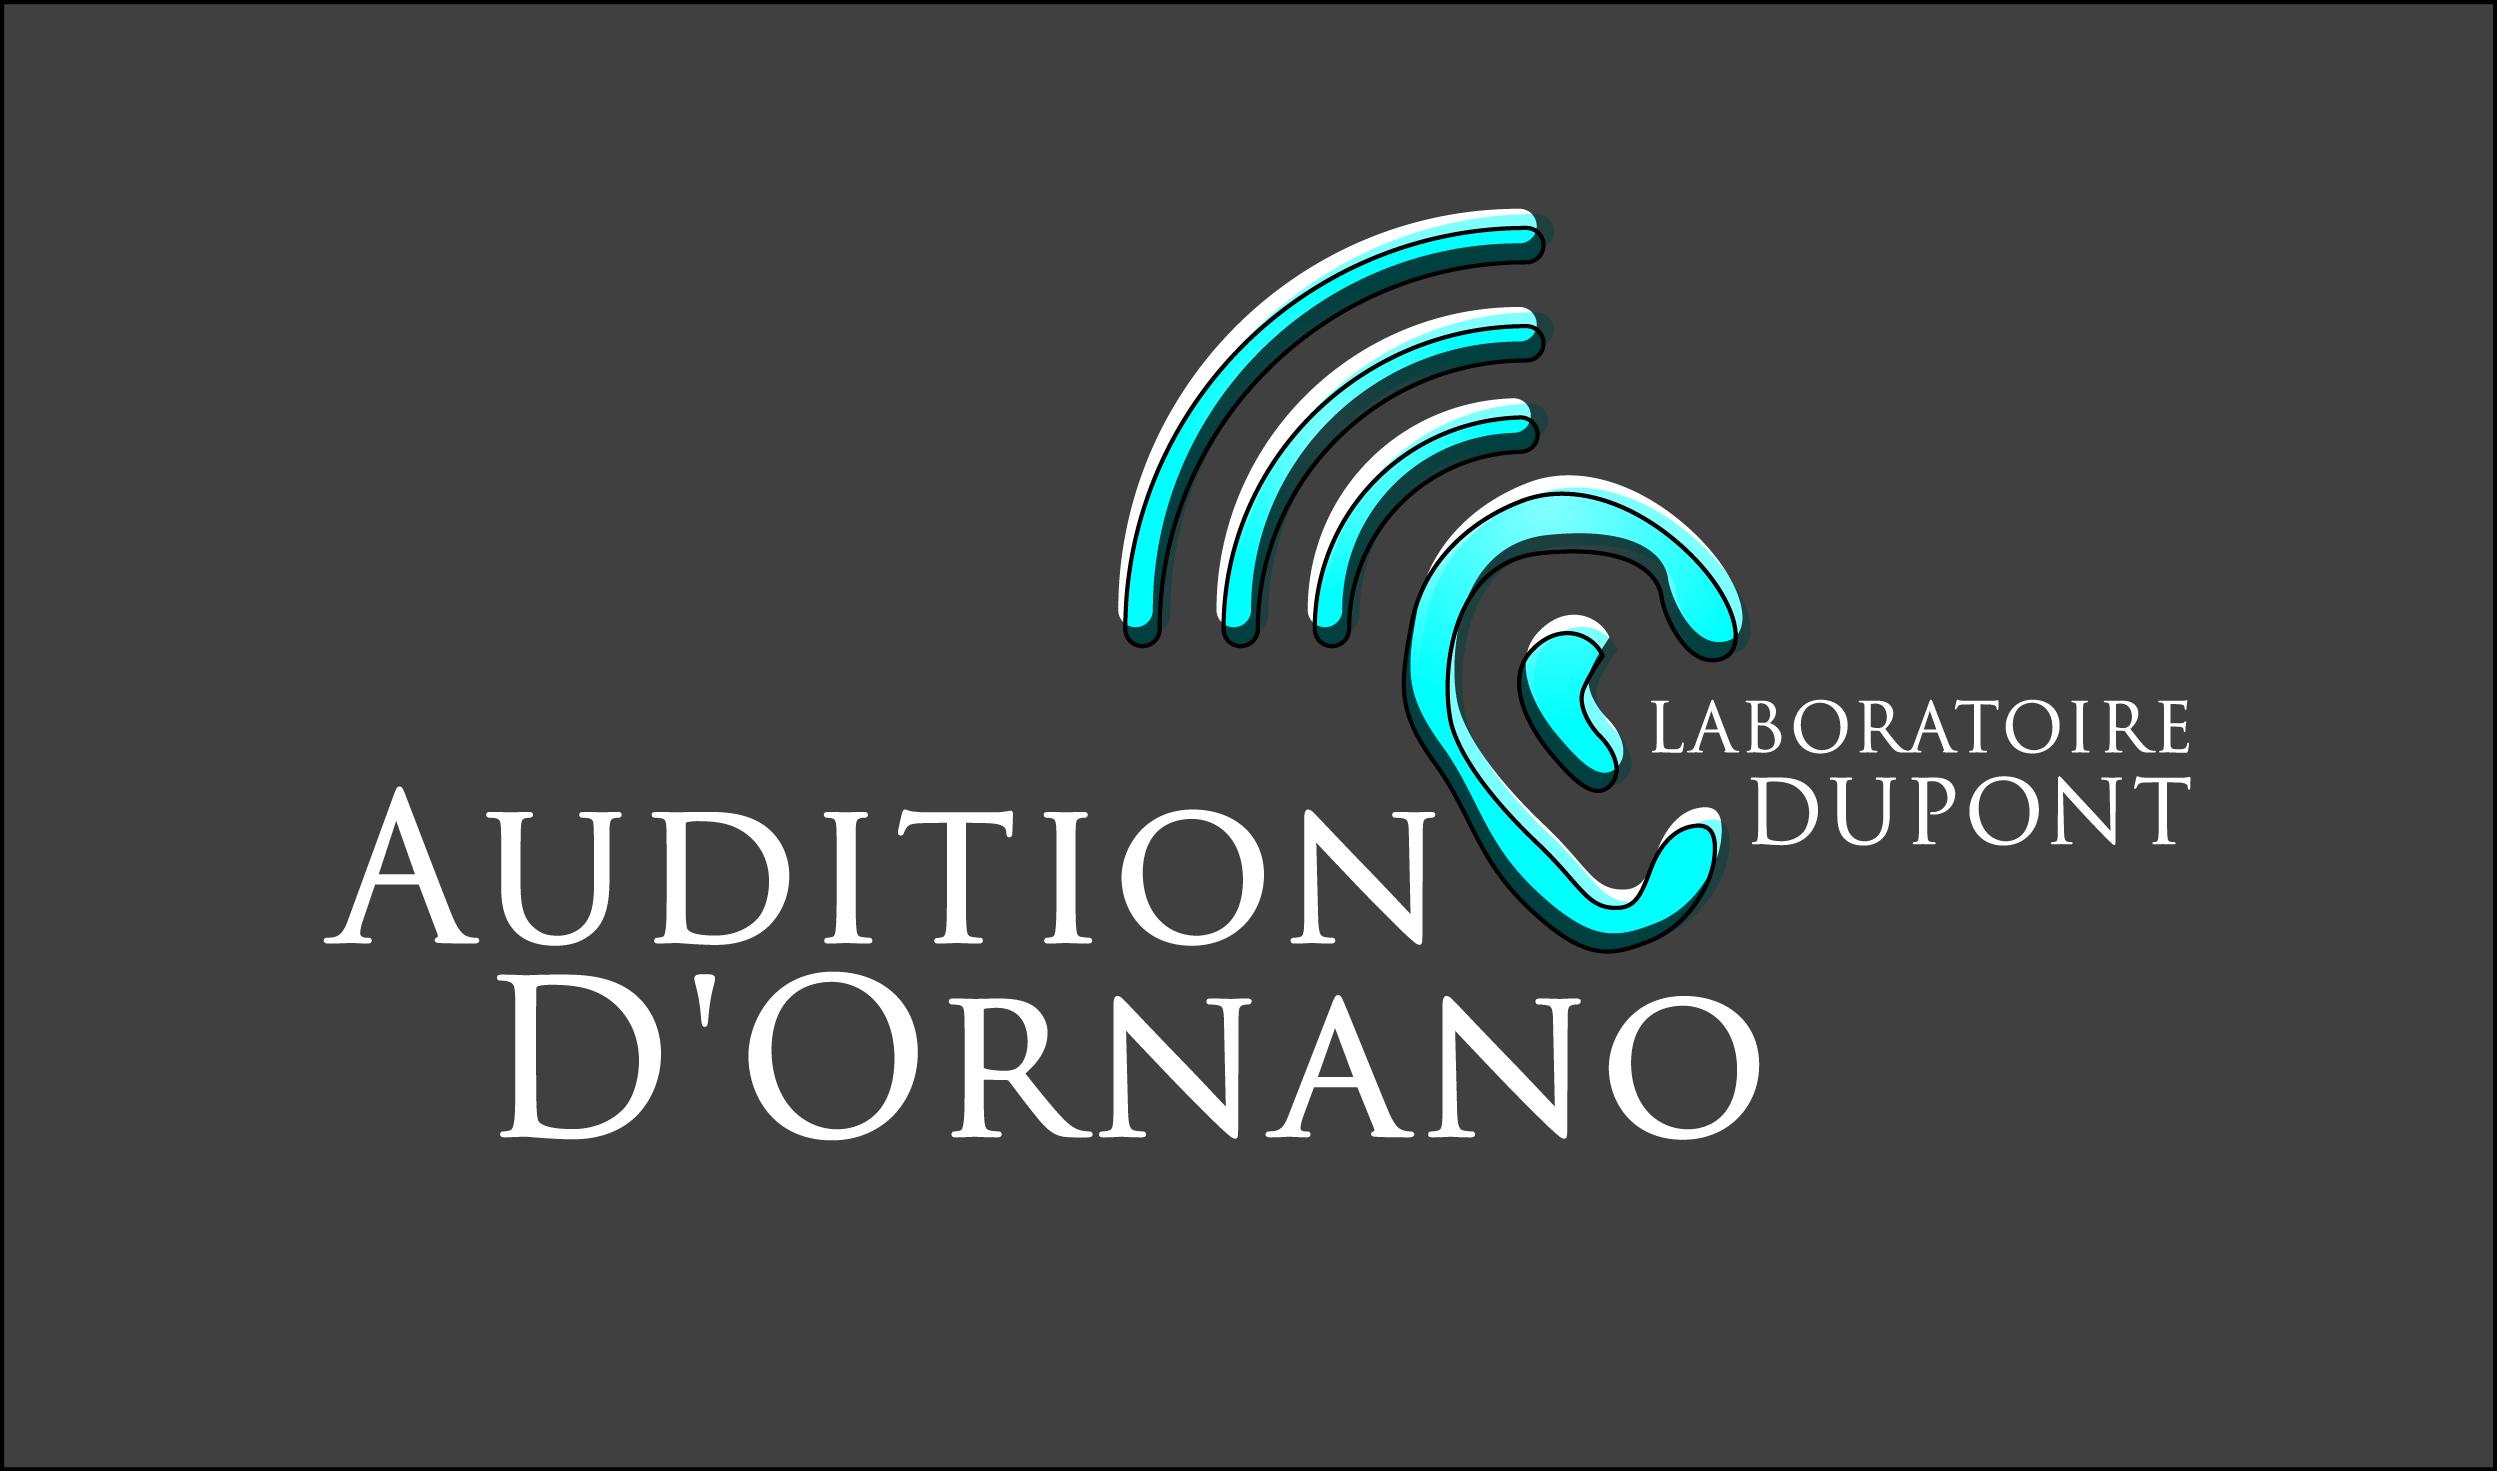 AUDITION D'ORNANO